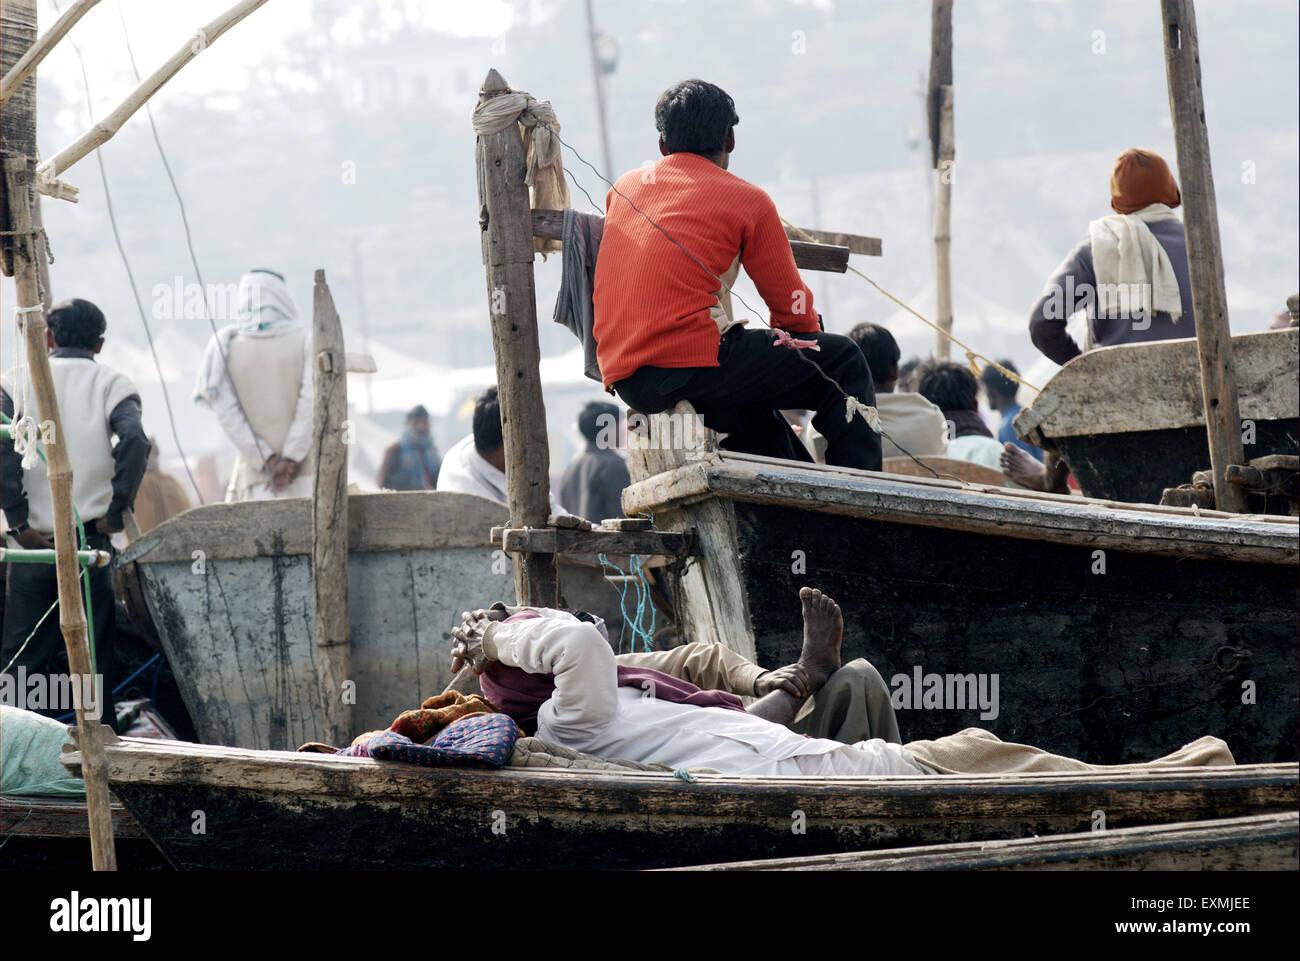 Devotee take nap on boat at confluence of Ganges; Yamuna and Saraswati rivers to take holy dip Ardh Kumbh Mela Allahabad - Stock Image